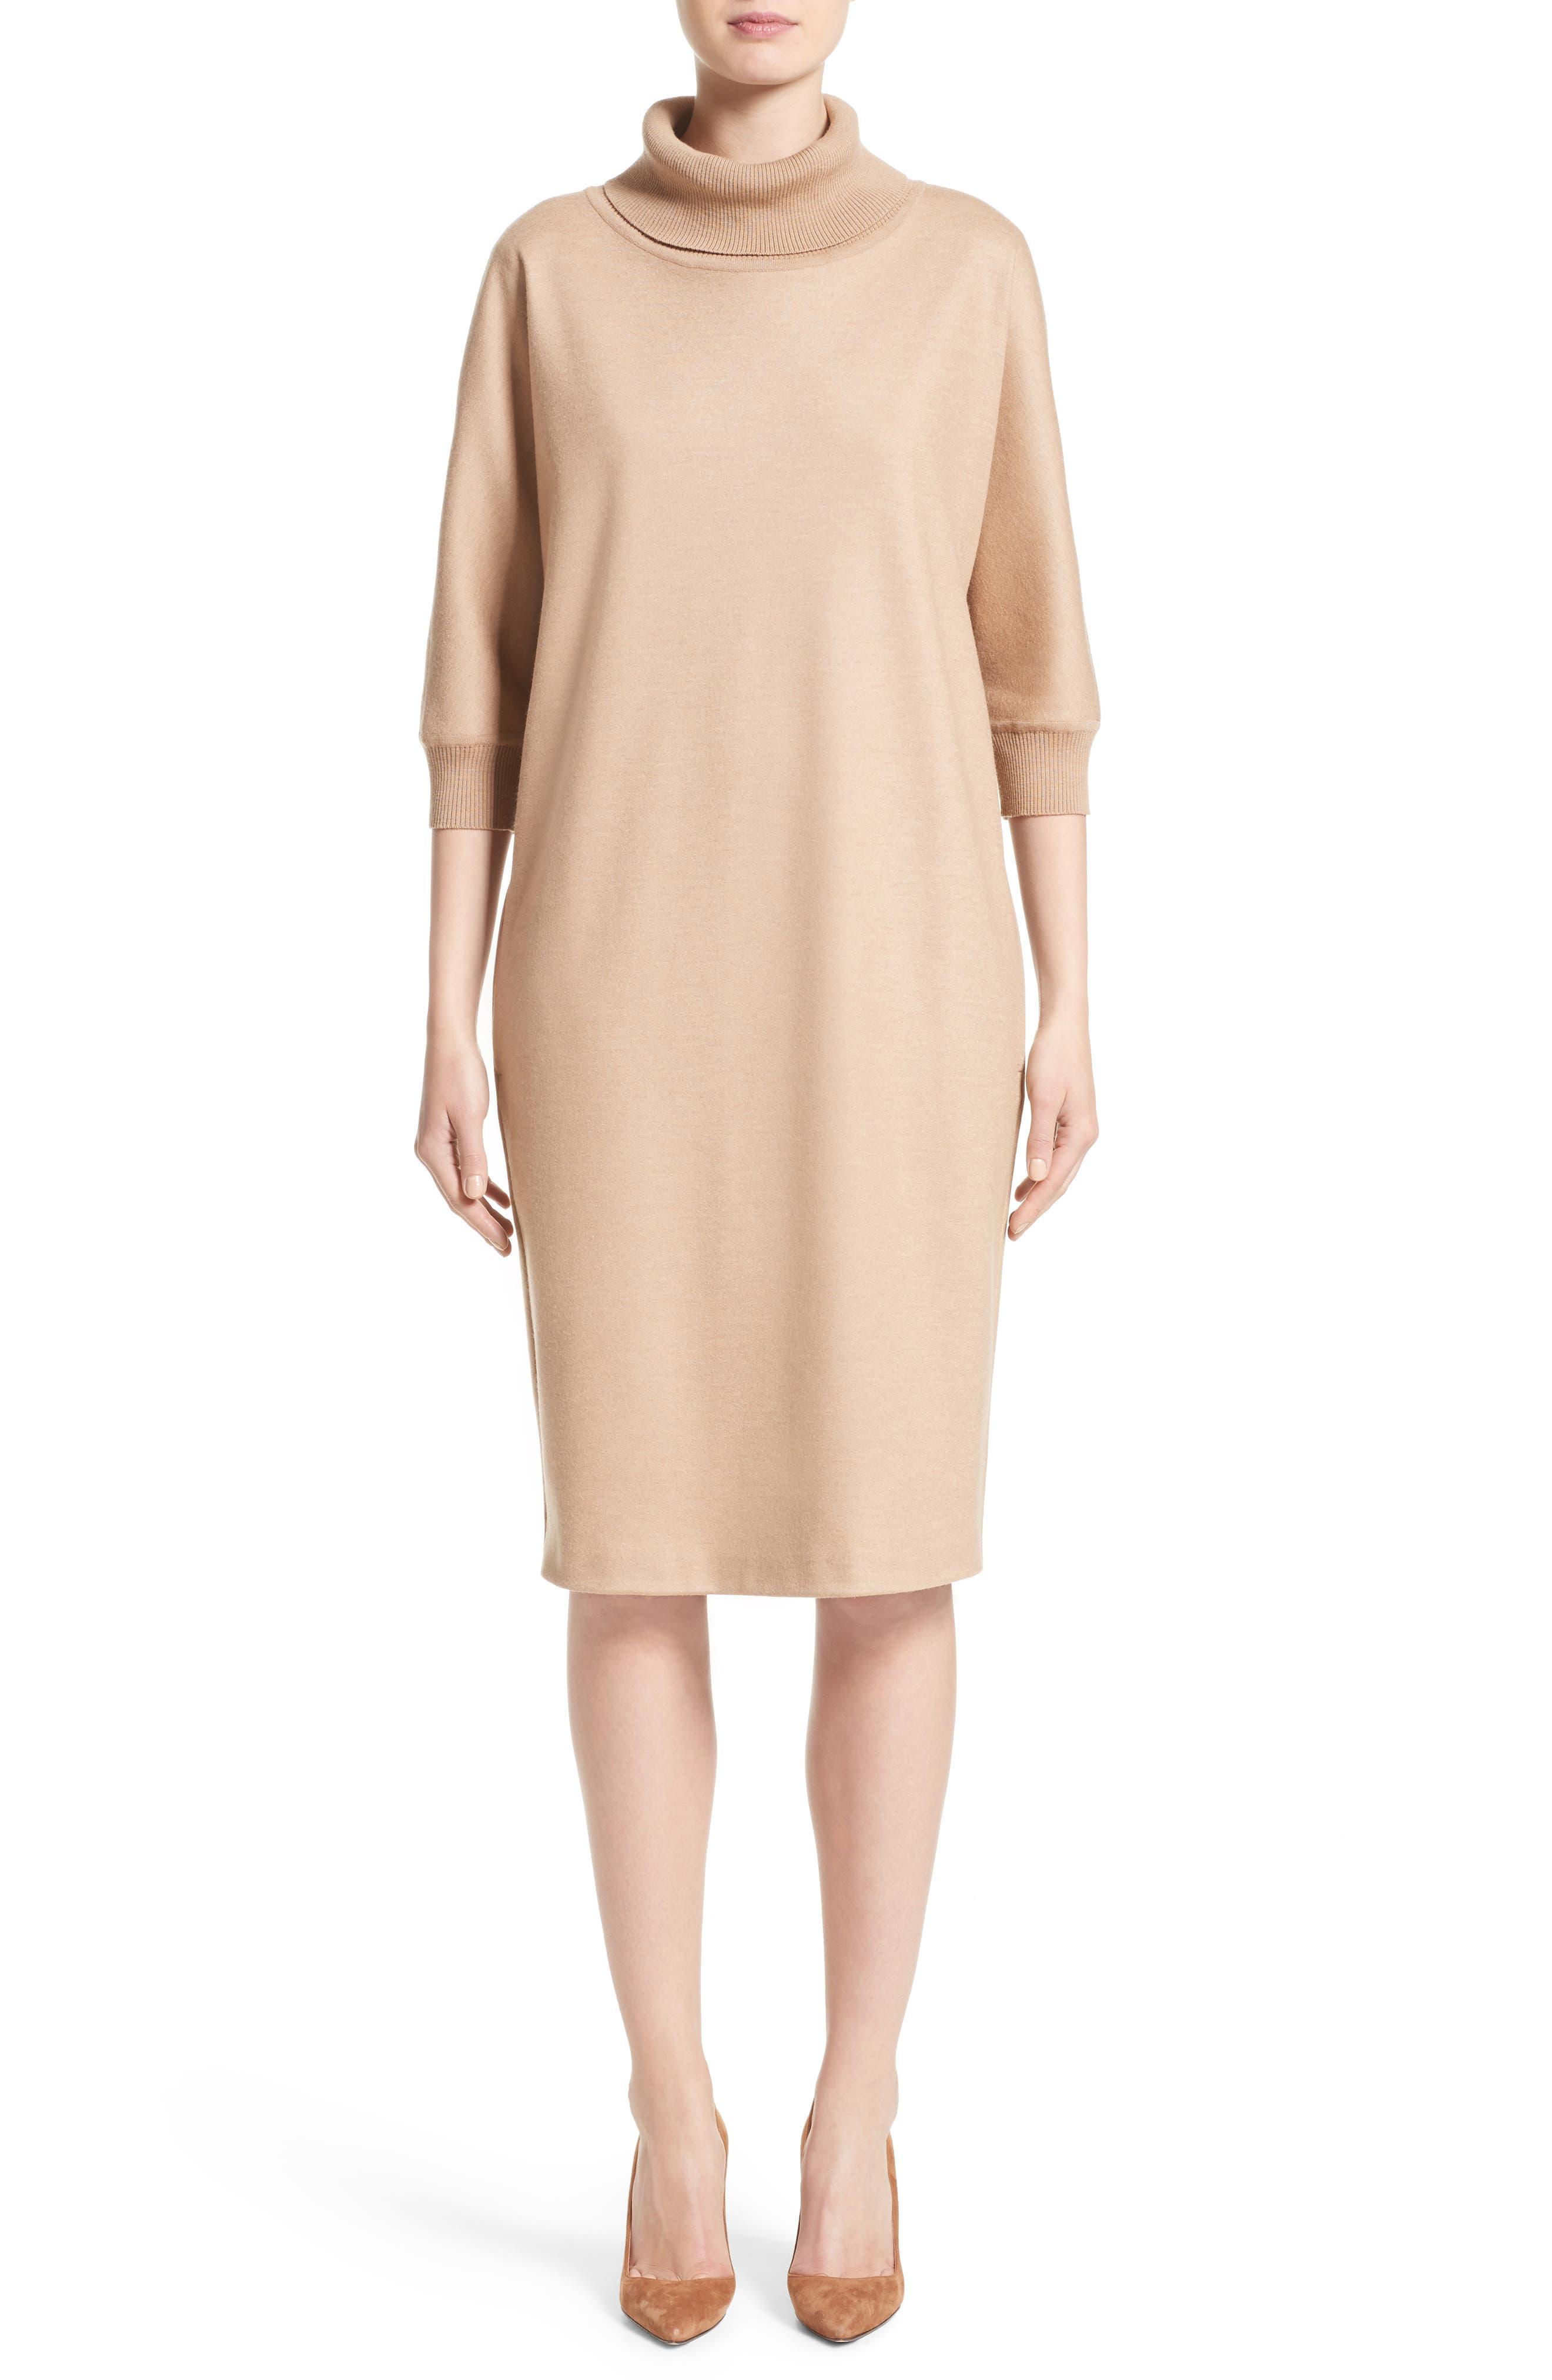 Agro Wool Turtleneck Dress,                             Main thumbnail 1, color,                             232